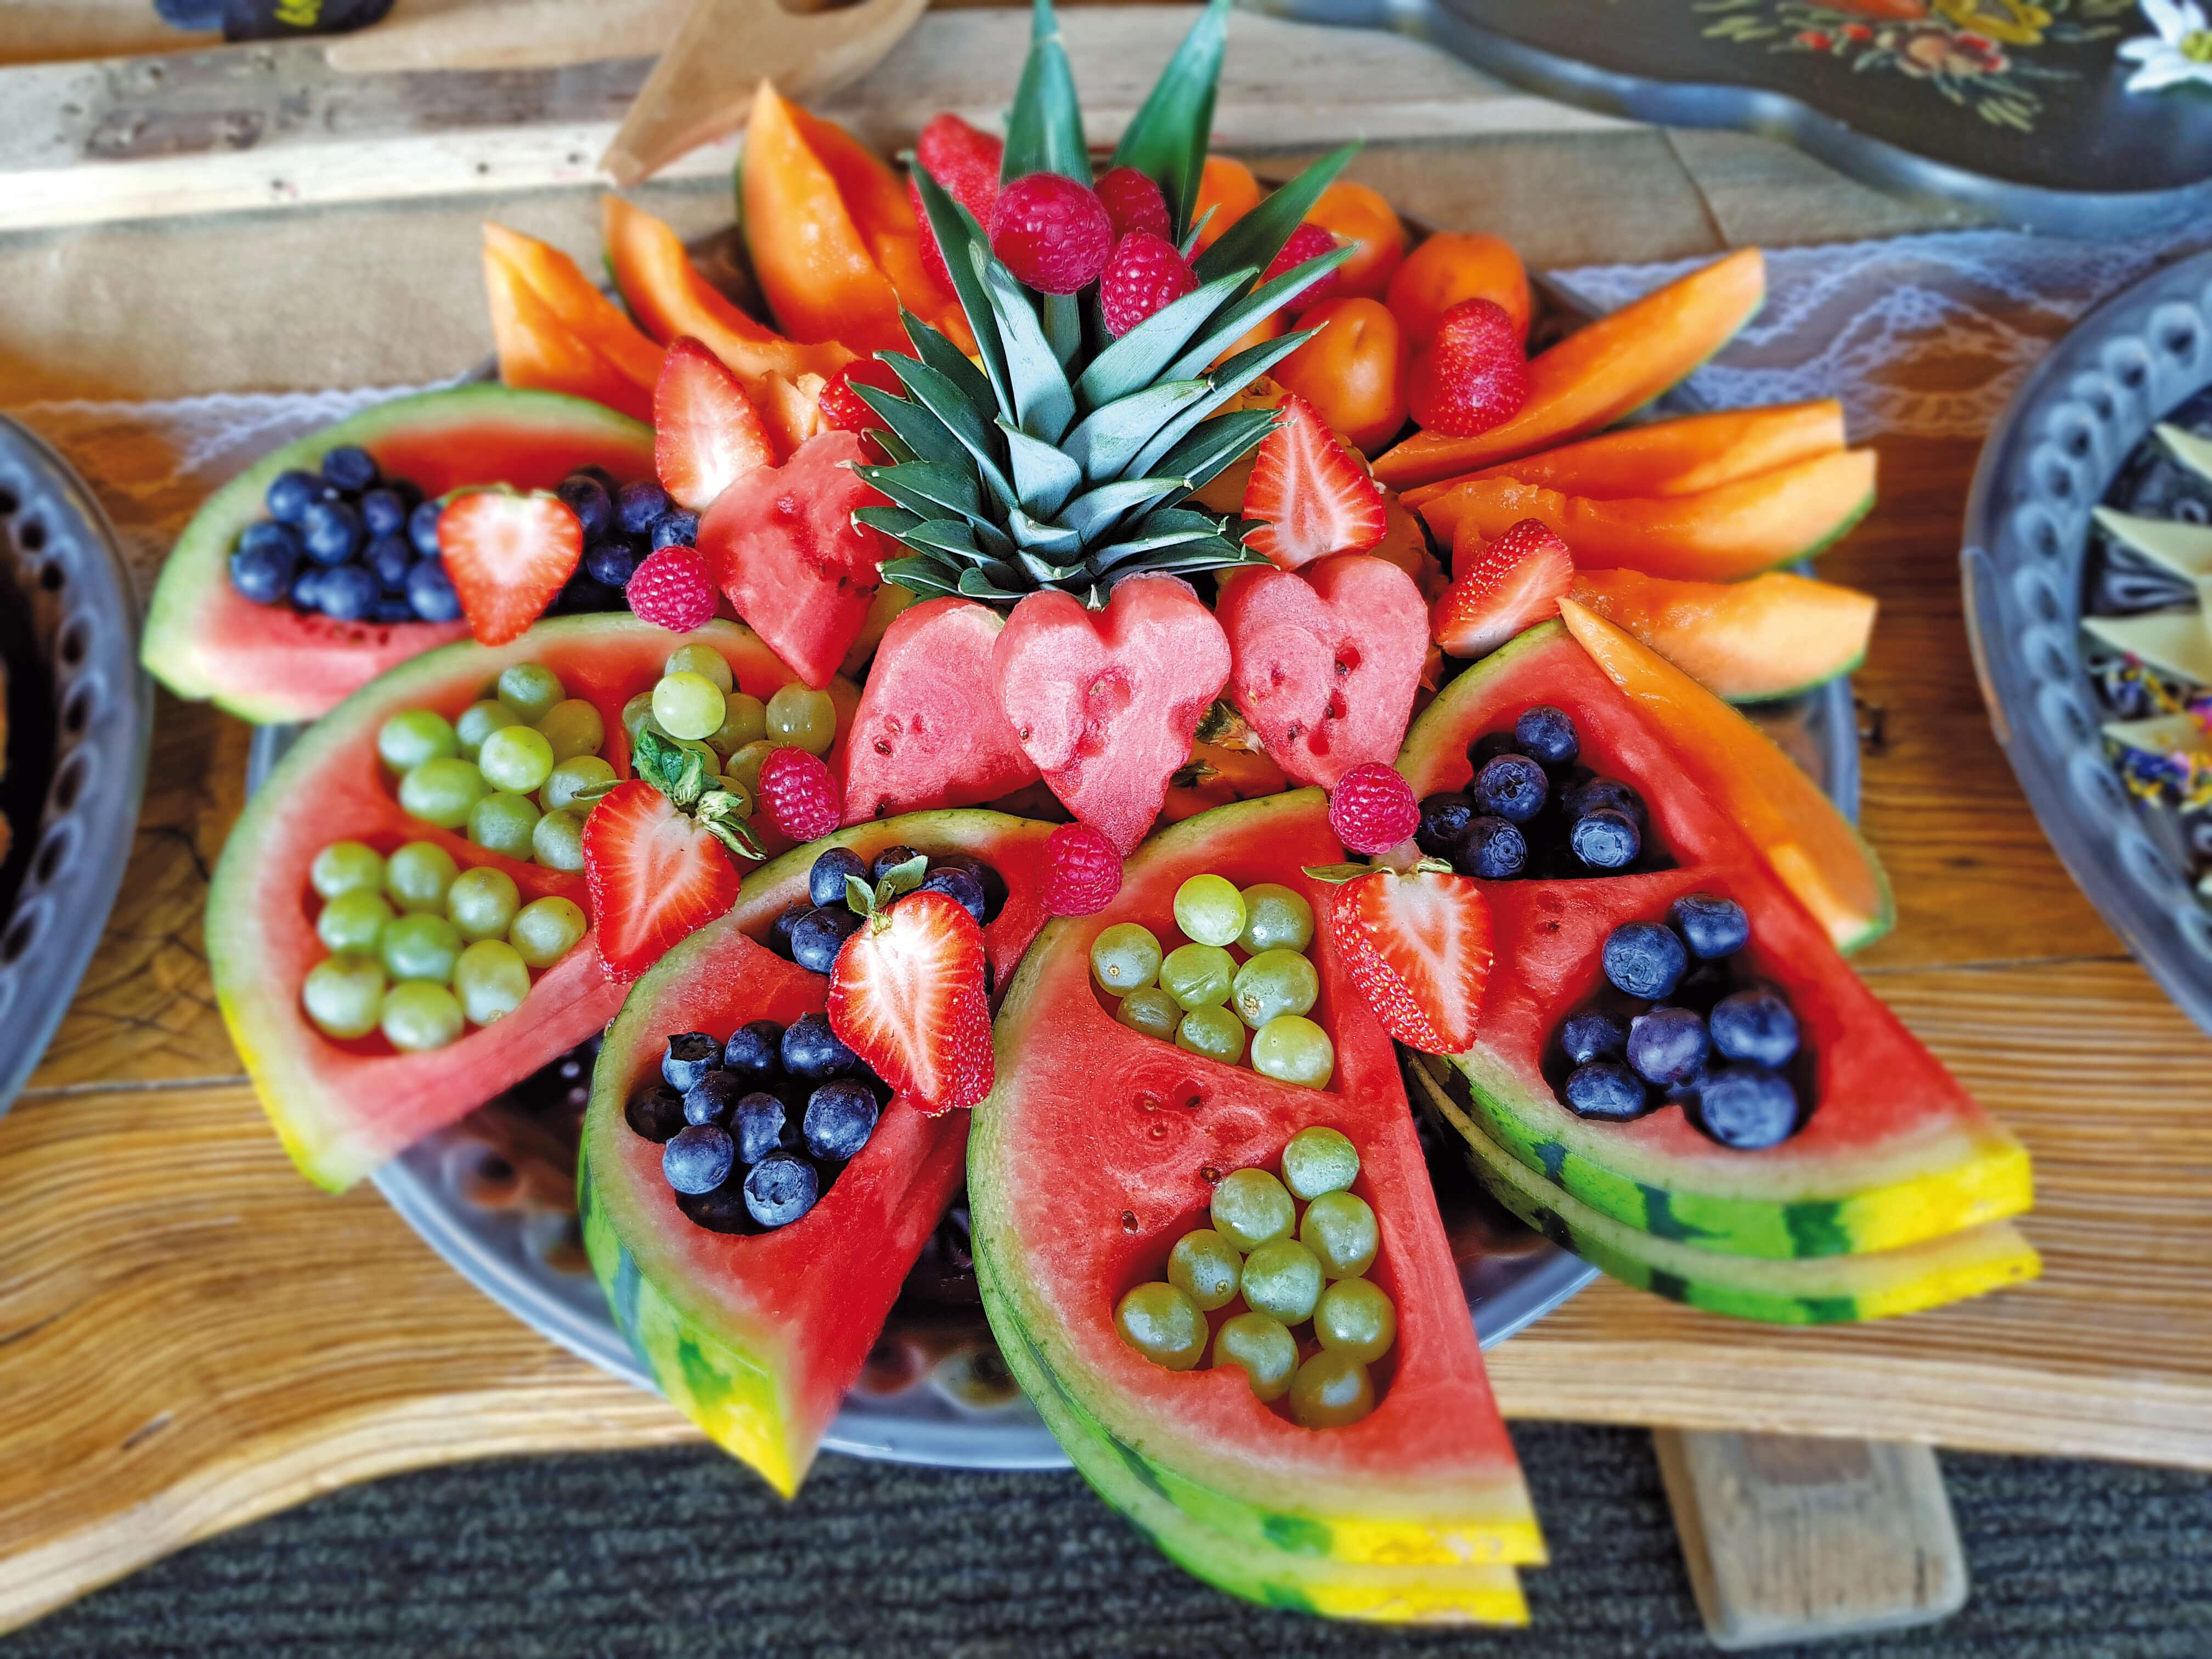 Berghotel Wiriehorn Brunch Früchte